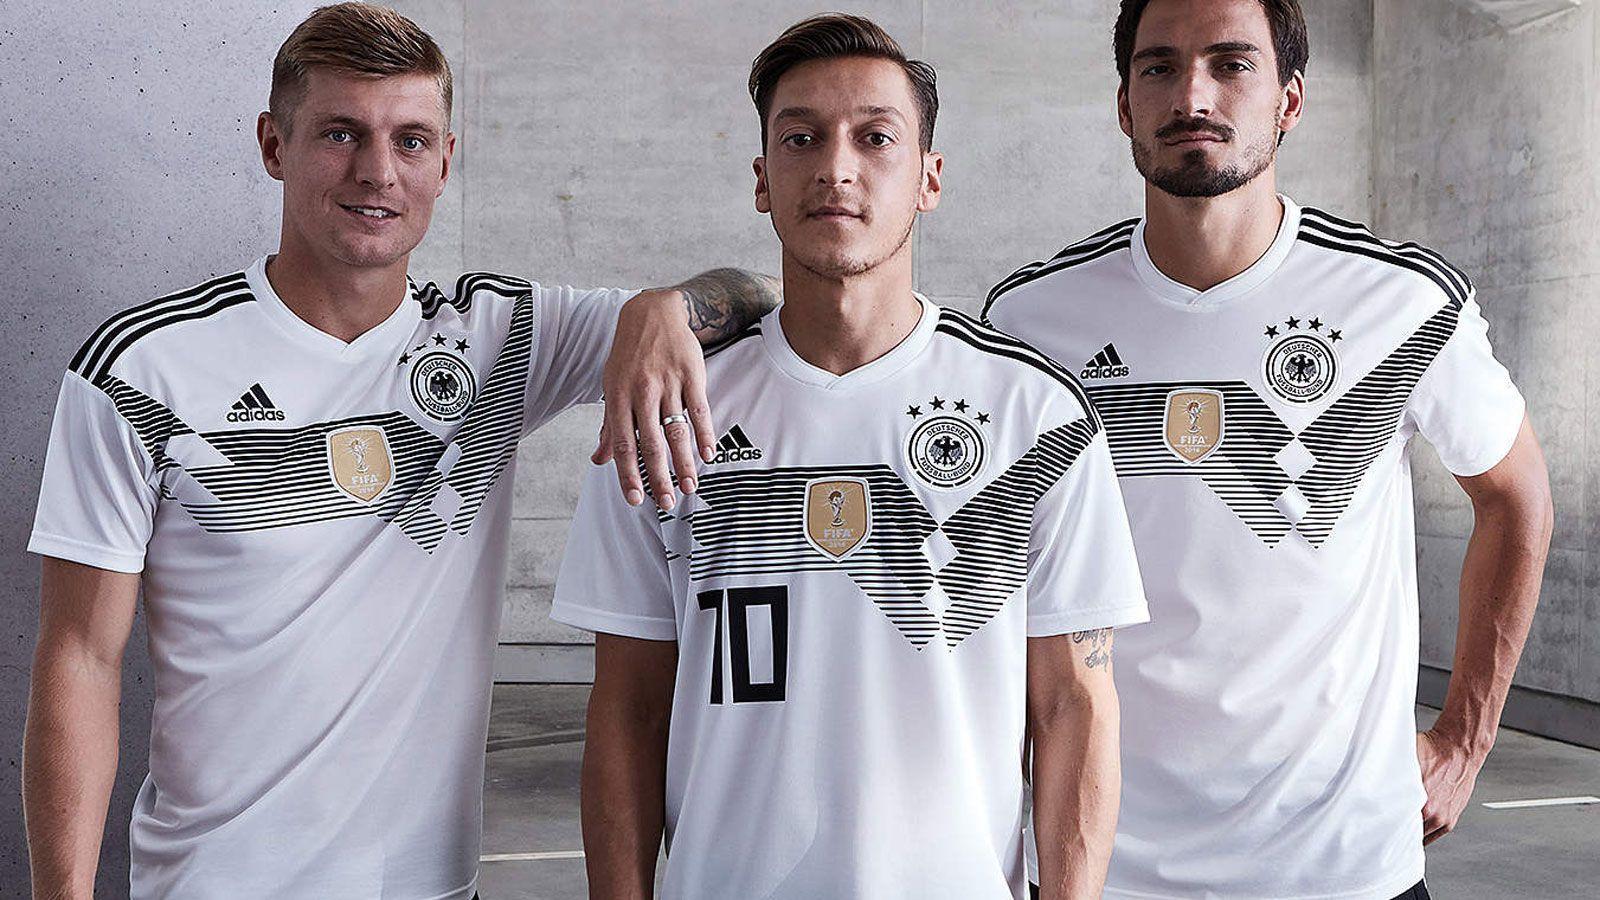 4f3d15ef12a71 2018 World Cup Kits: Adidas away uniforms revealed (PHOTOS) | SI.com